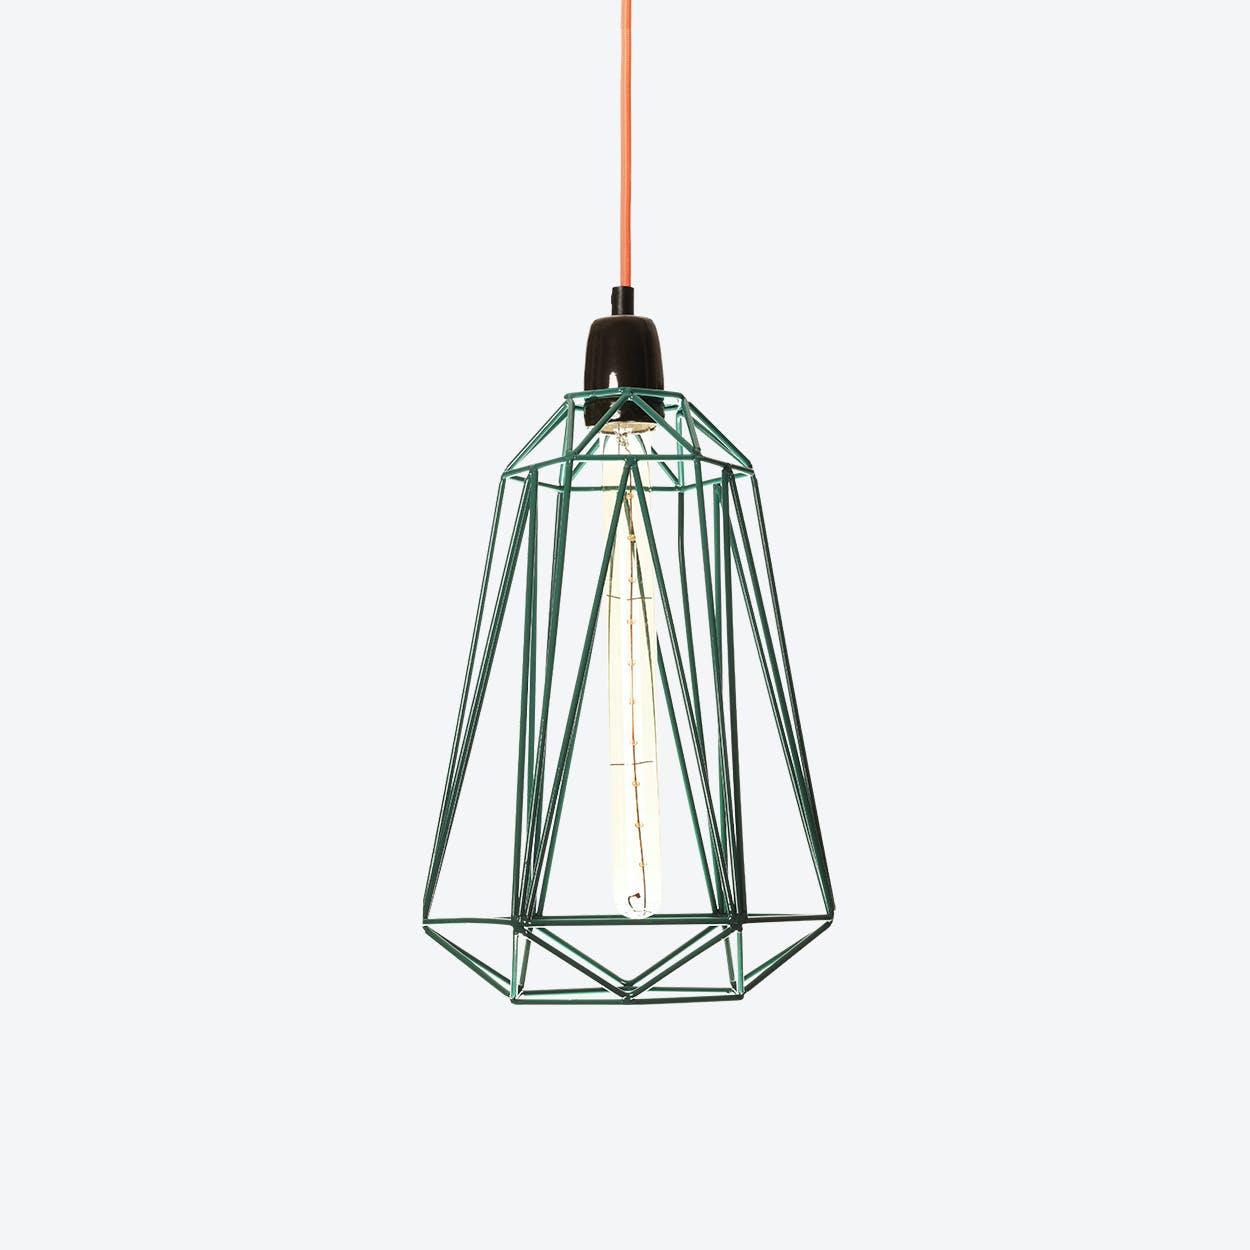 Industrial Pendant Light Medium Diamond in Blue with Orange Cord